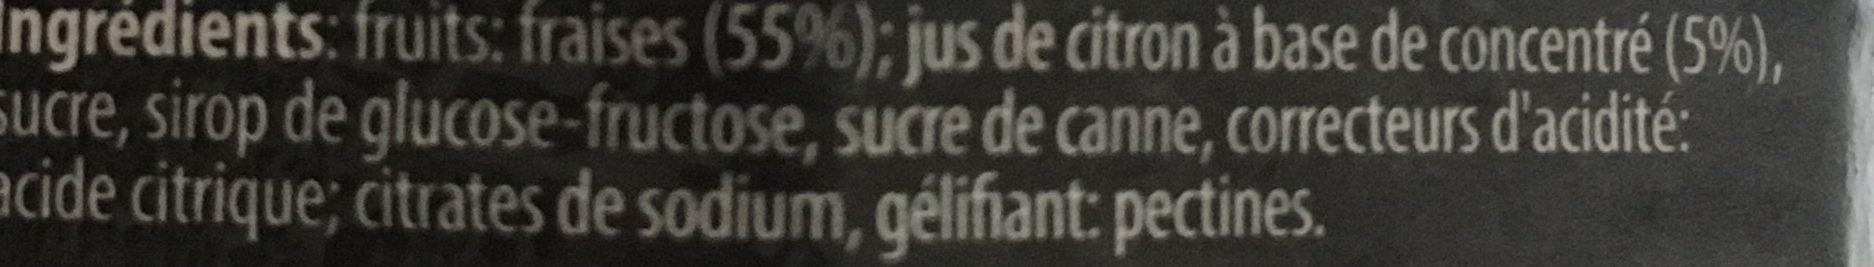 Confiture Extra de Fraise - Ingrediënten - fr